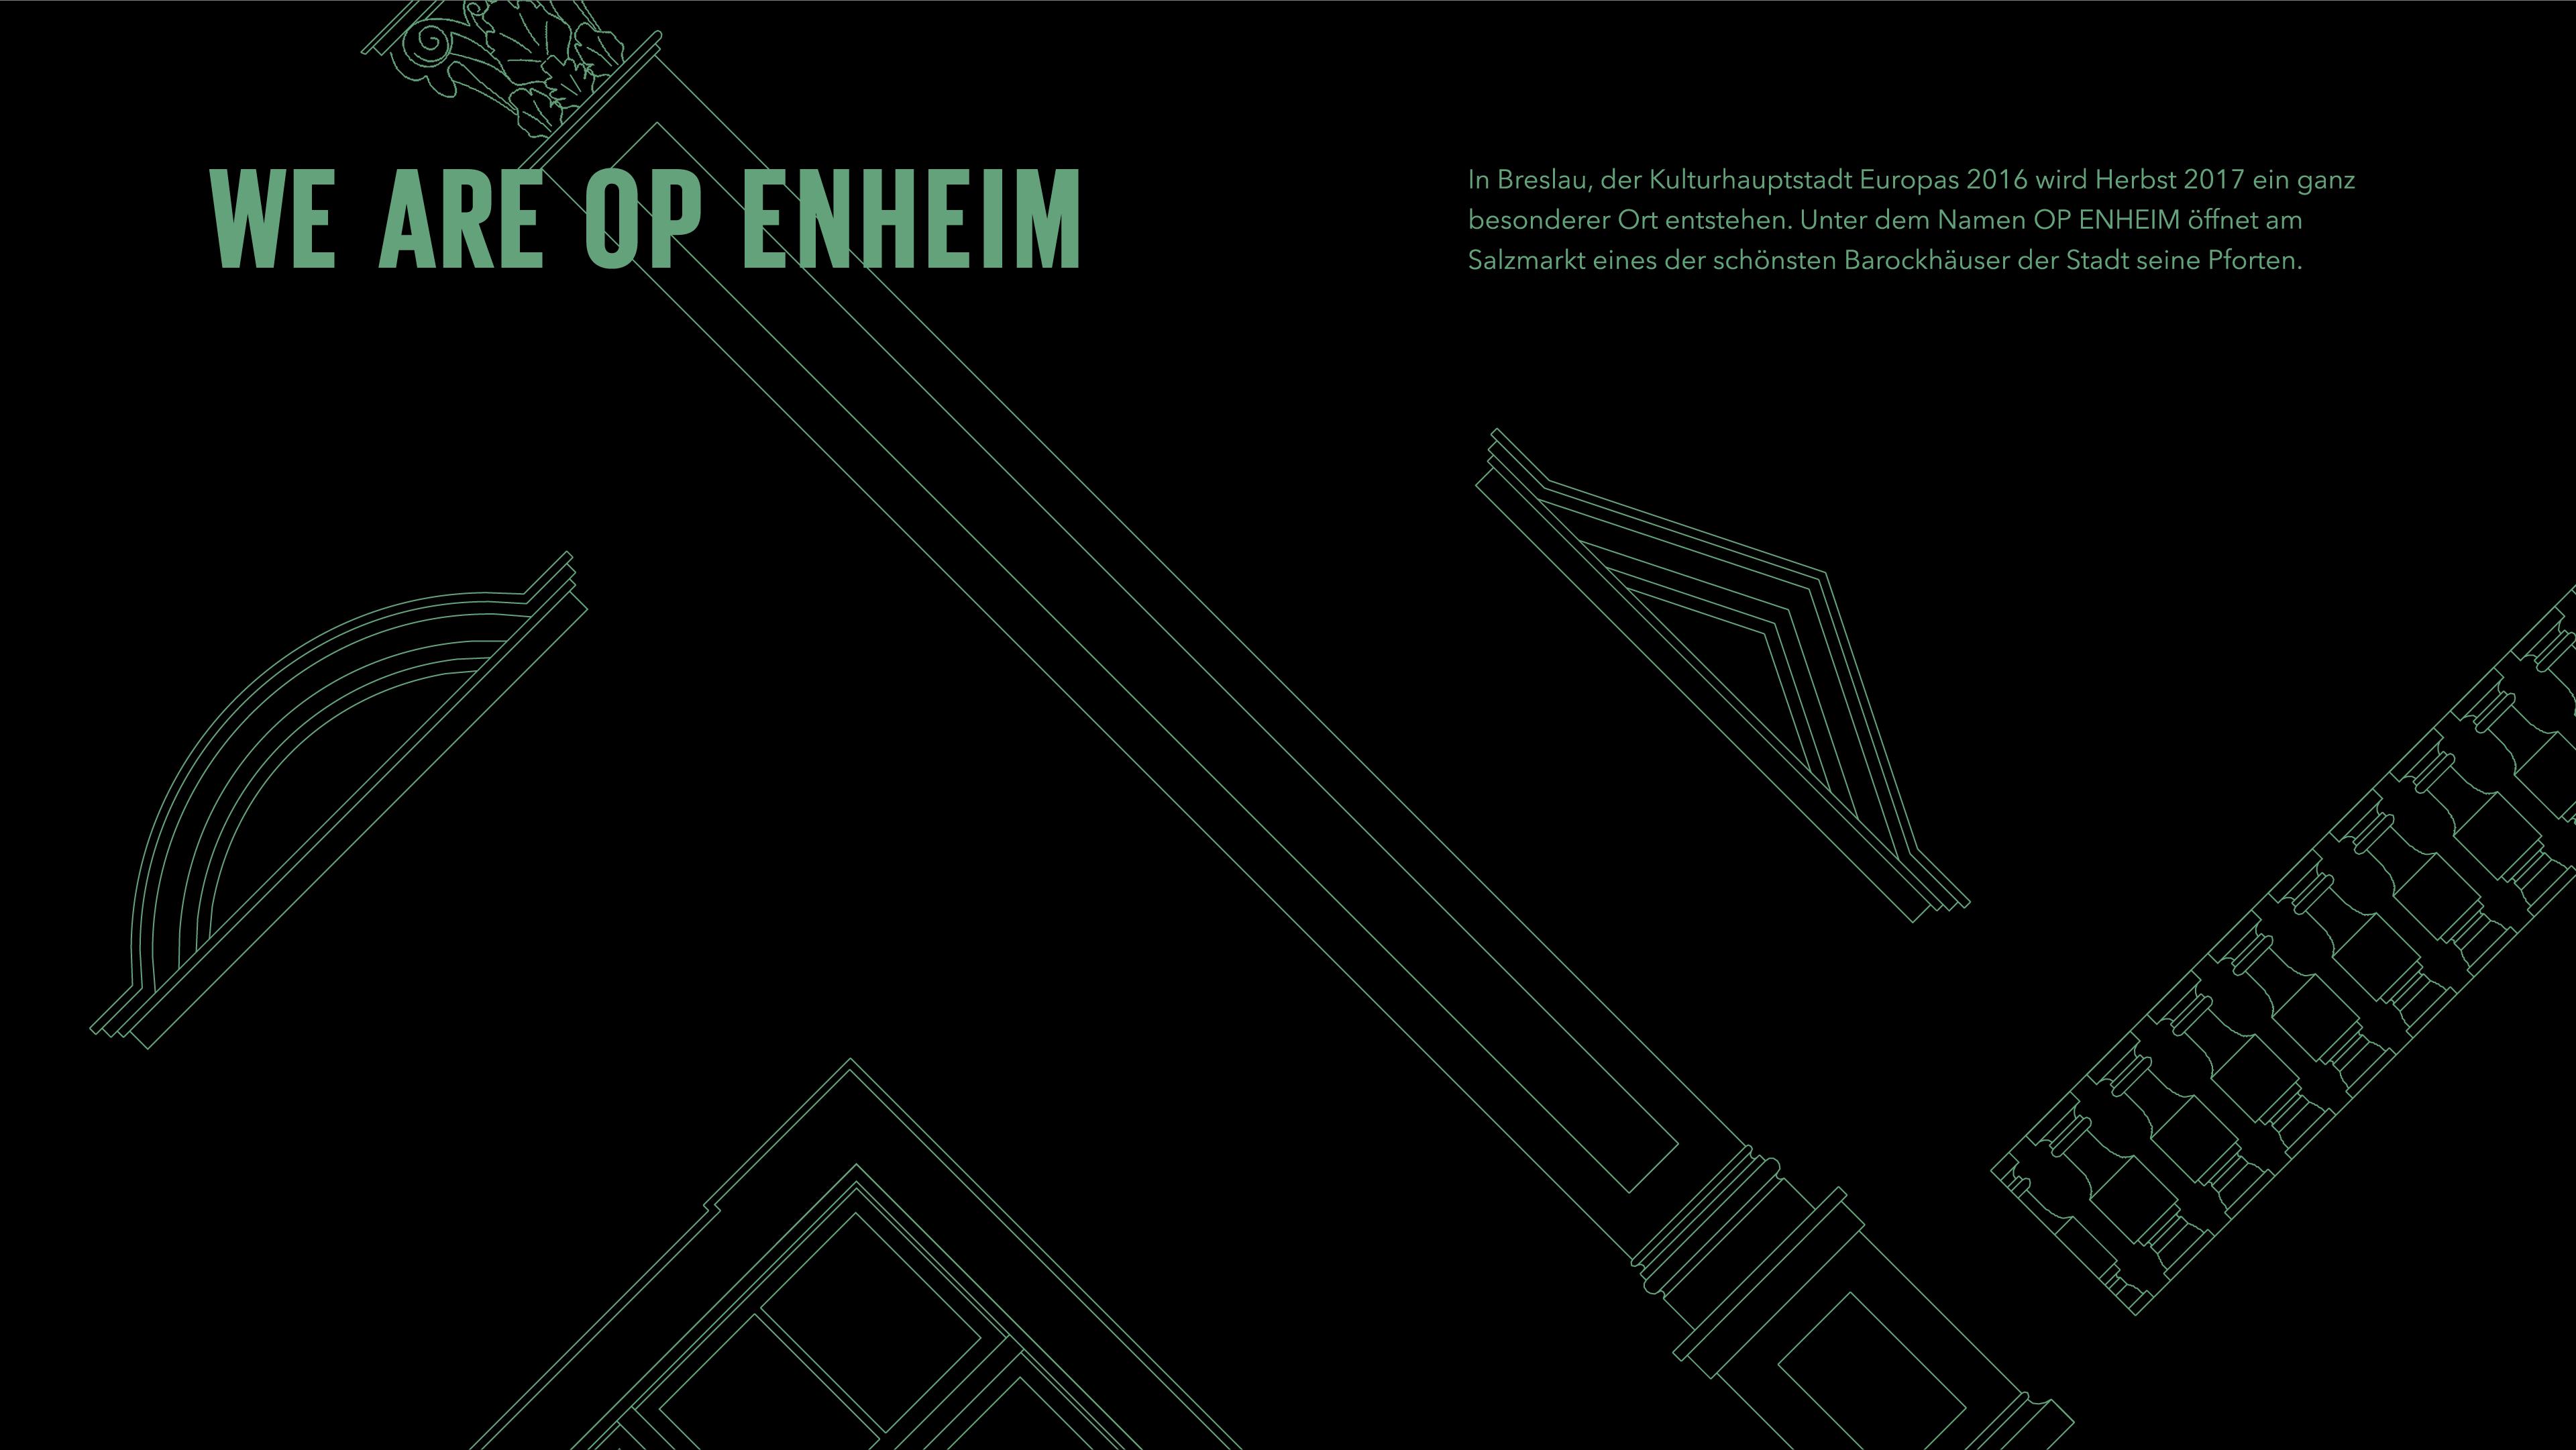 OP ENHEIM - The Codeine Design